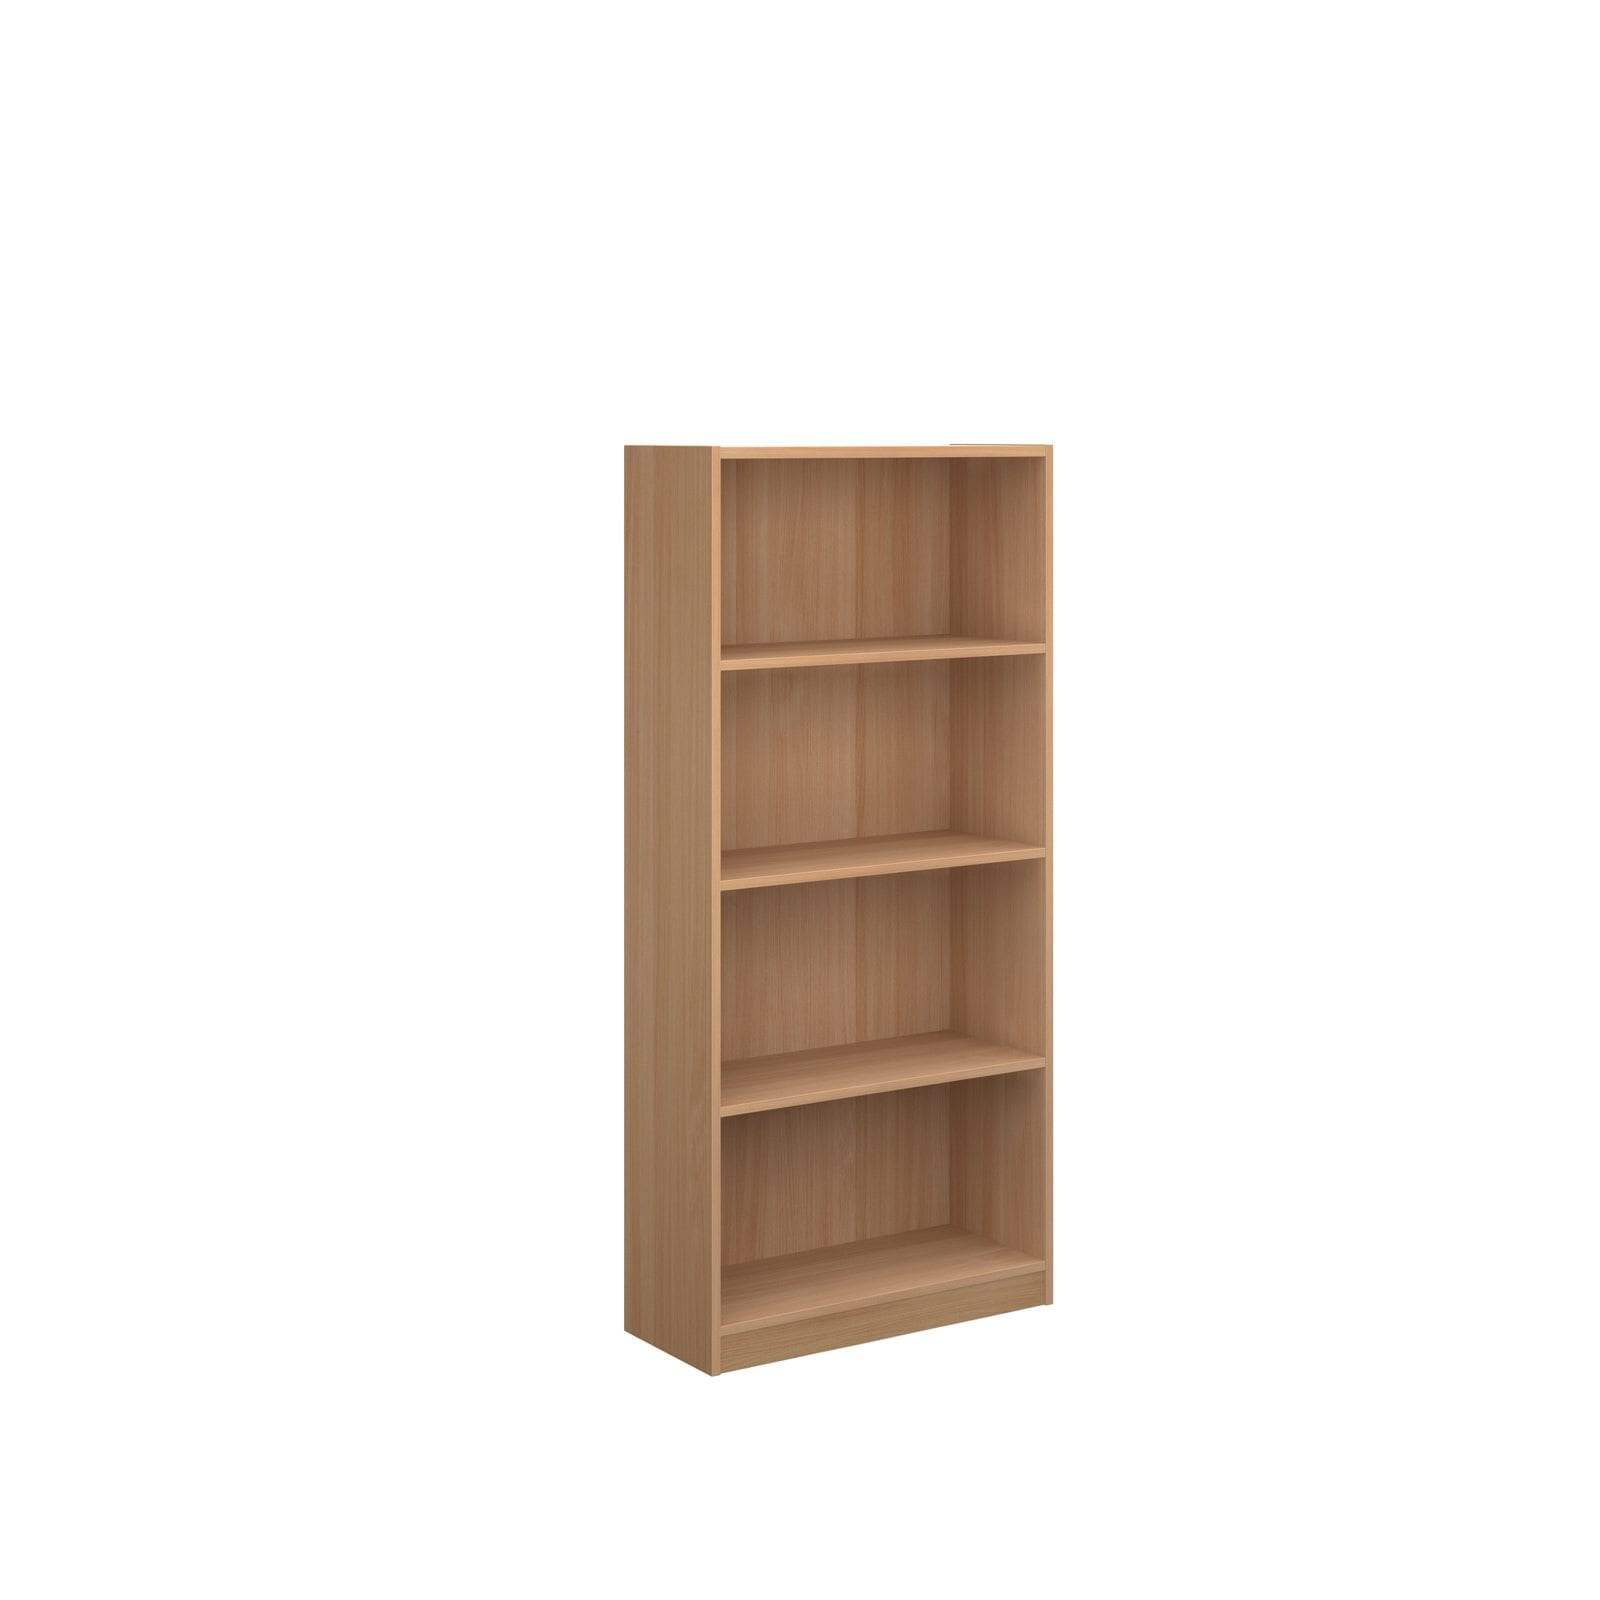 Bookcase Tbc Beech Penningtons Office Furniture